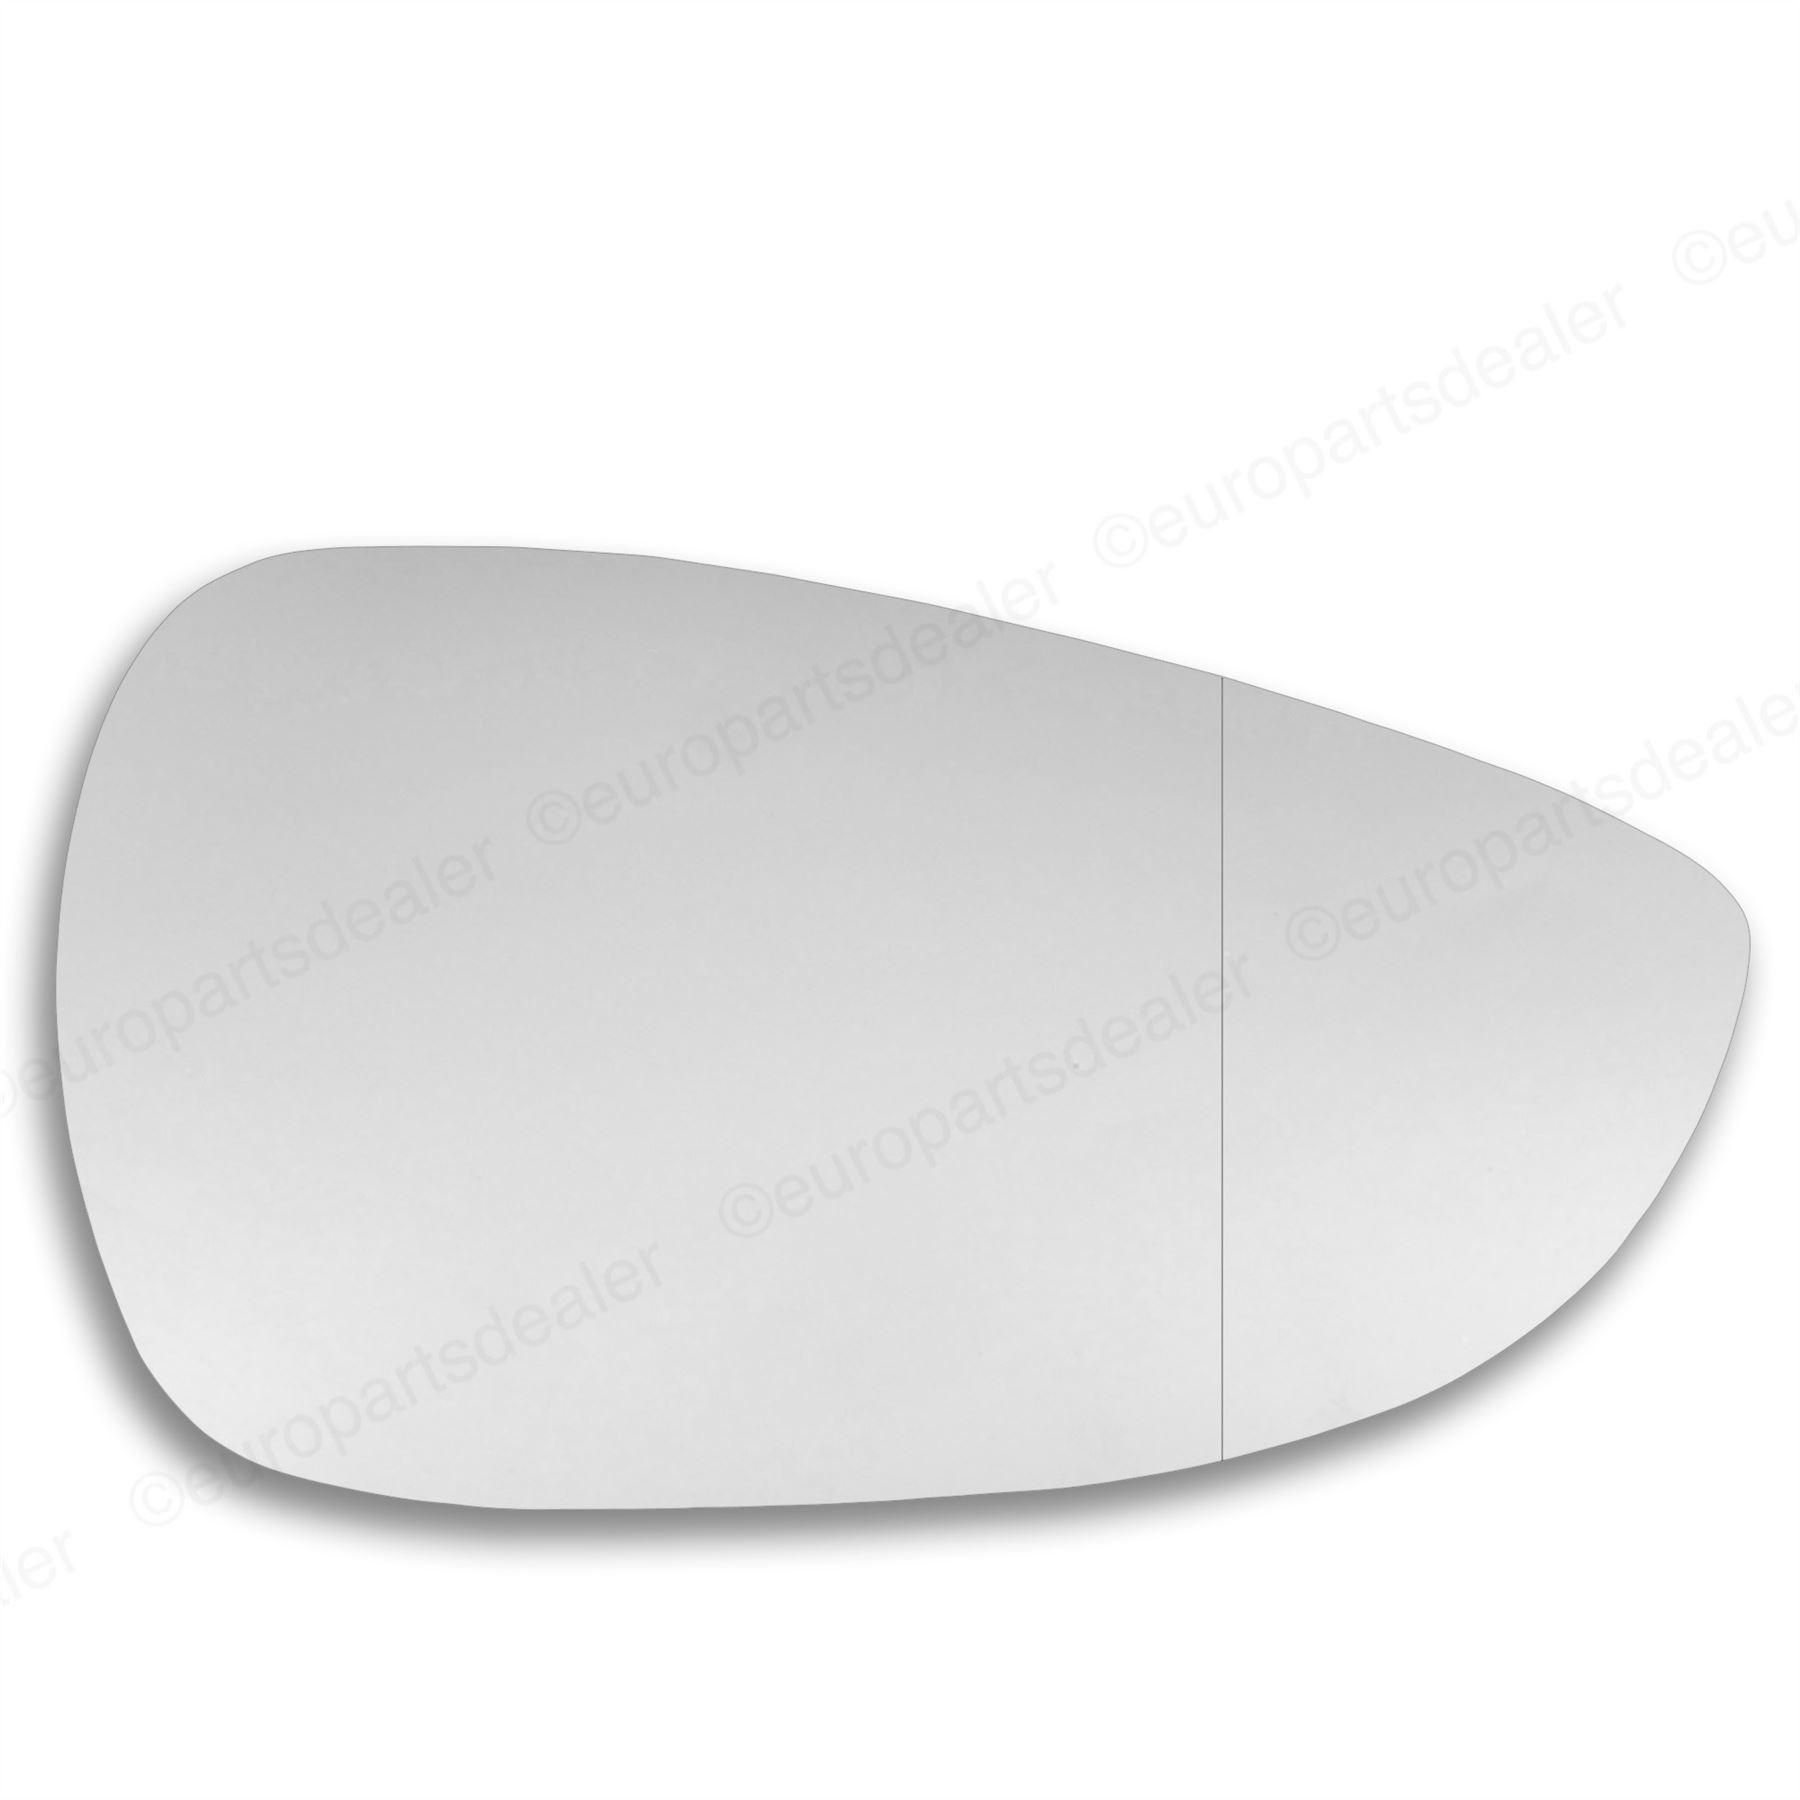 Lado Del Conductor Ala Gran Angular Puerta Espejo De Cristal Mini un palillo de 2007-2013 en BMW